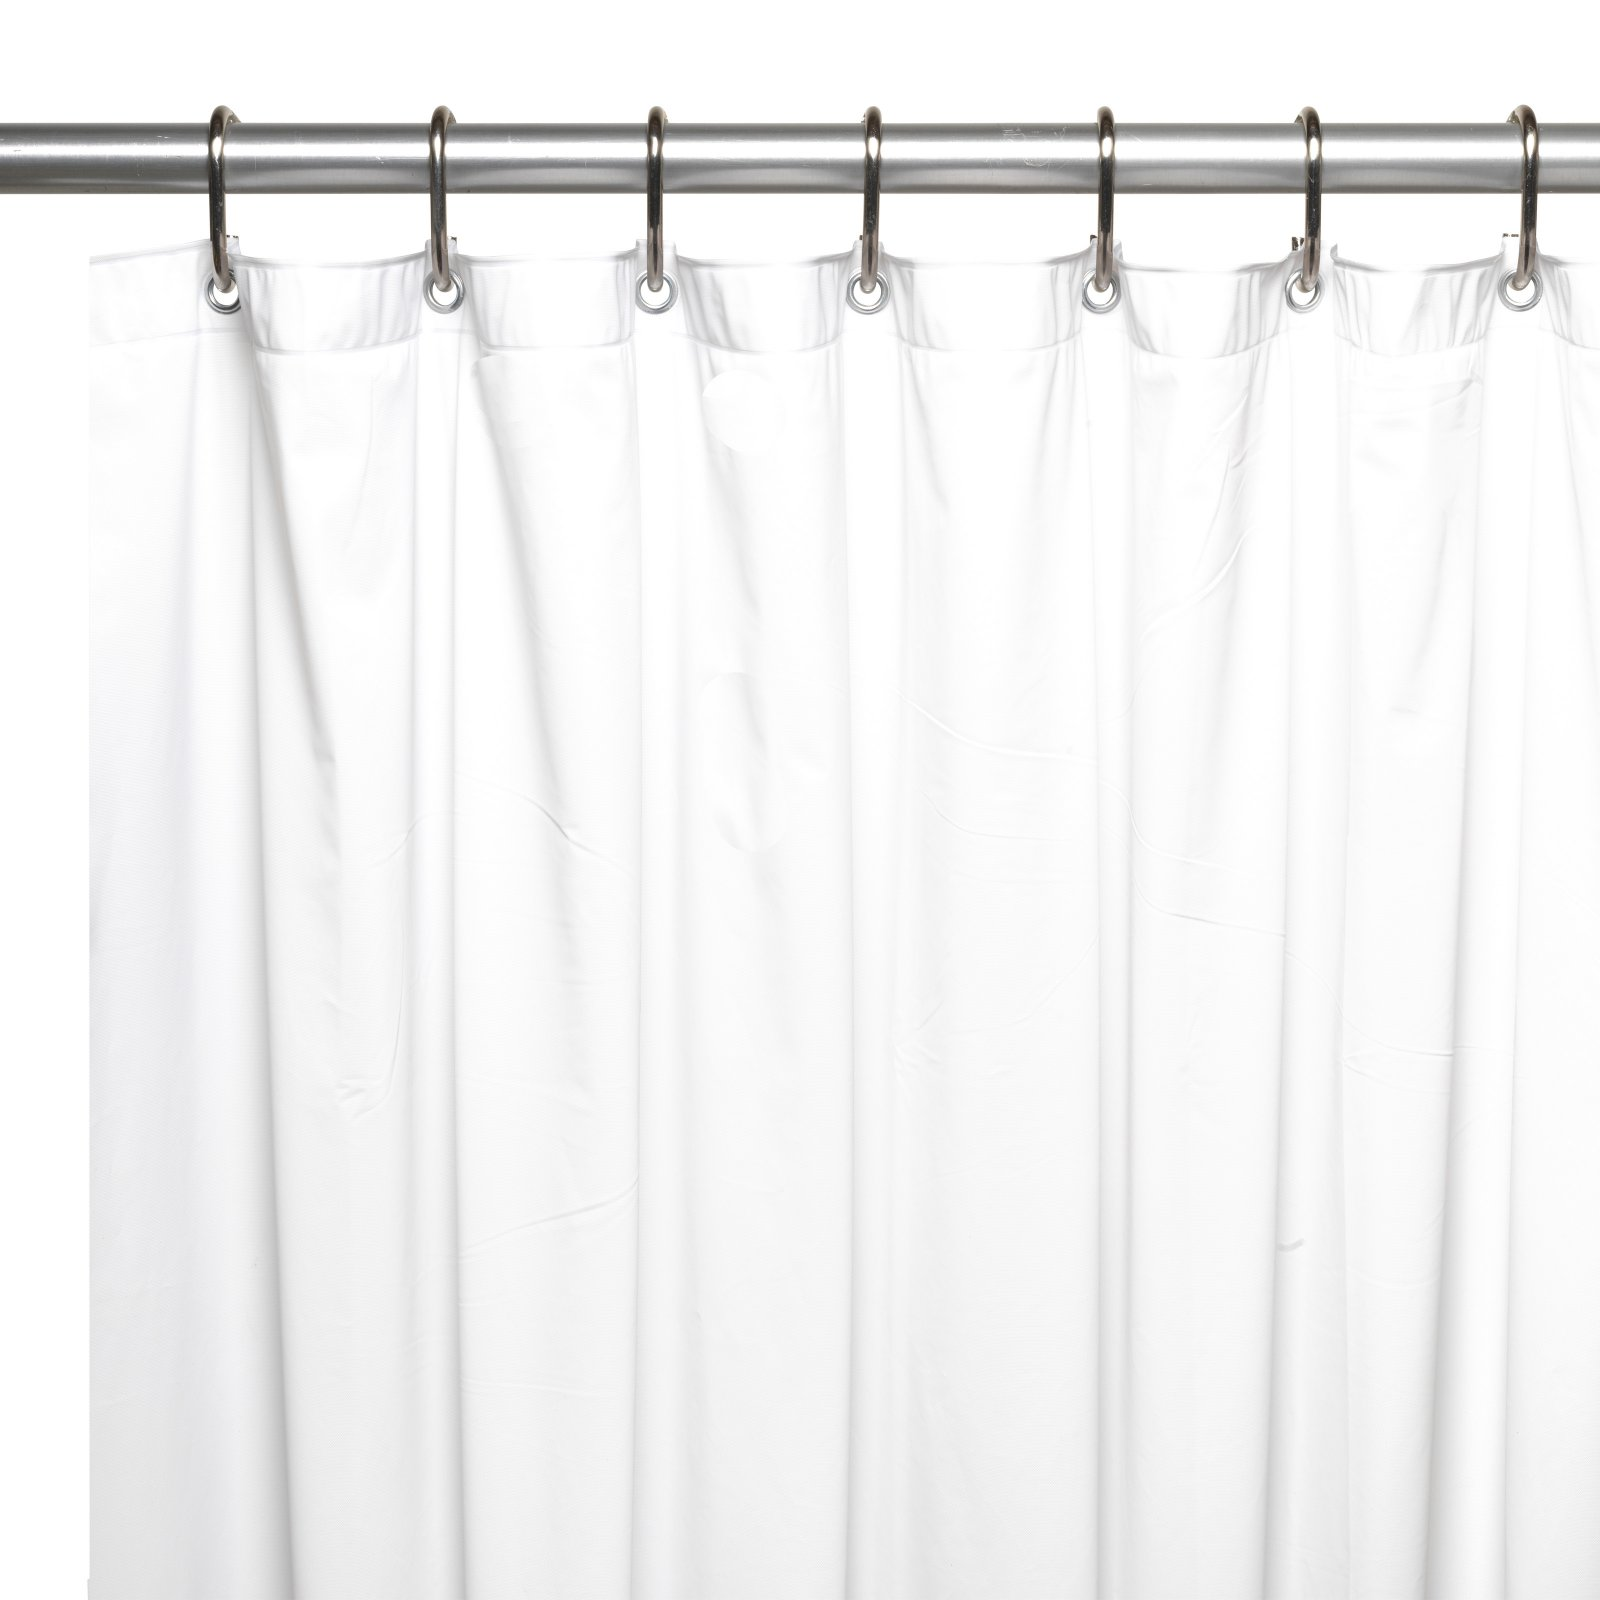 shower stall sized 54 x 78 mildew resistant 10 gauge vinyl shower curtain liner w metal grommets and reinforced mesh header in bone